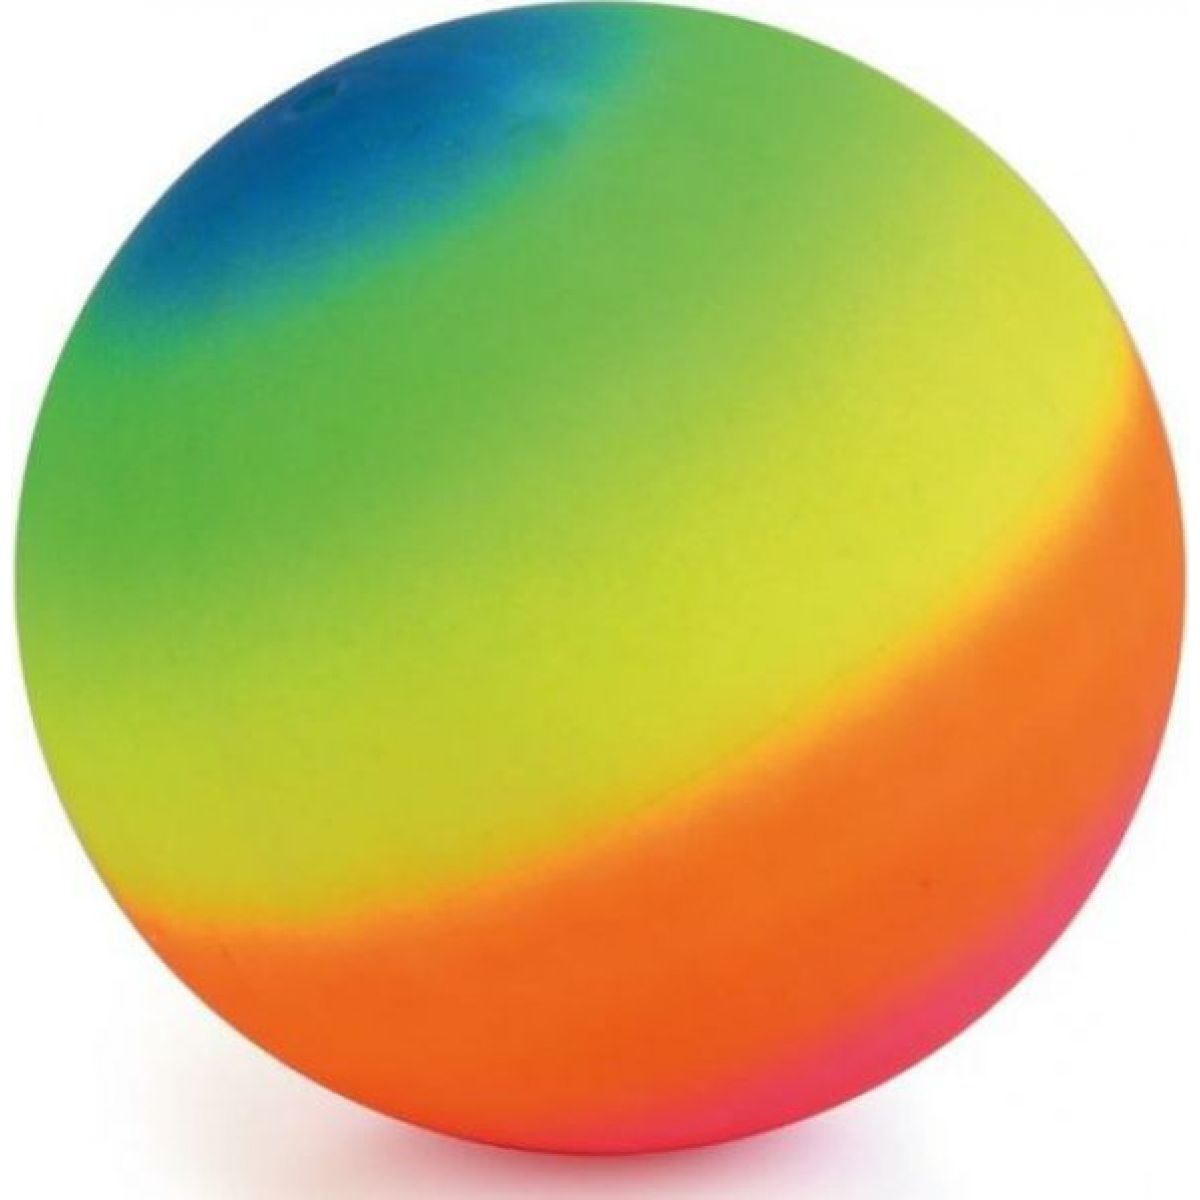 John Toys Duhový míč 20 cm barevný